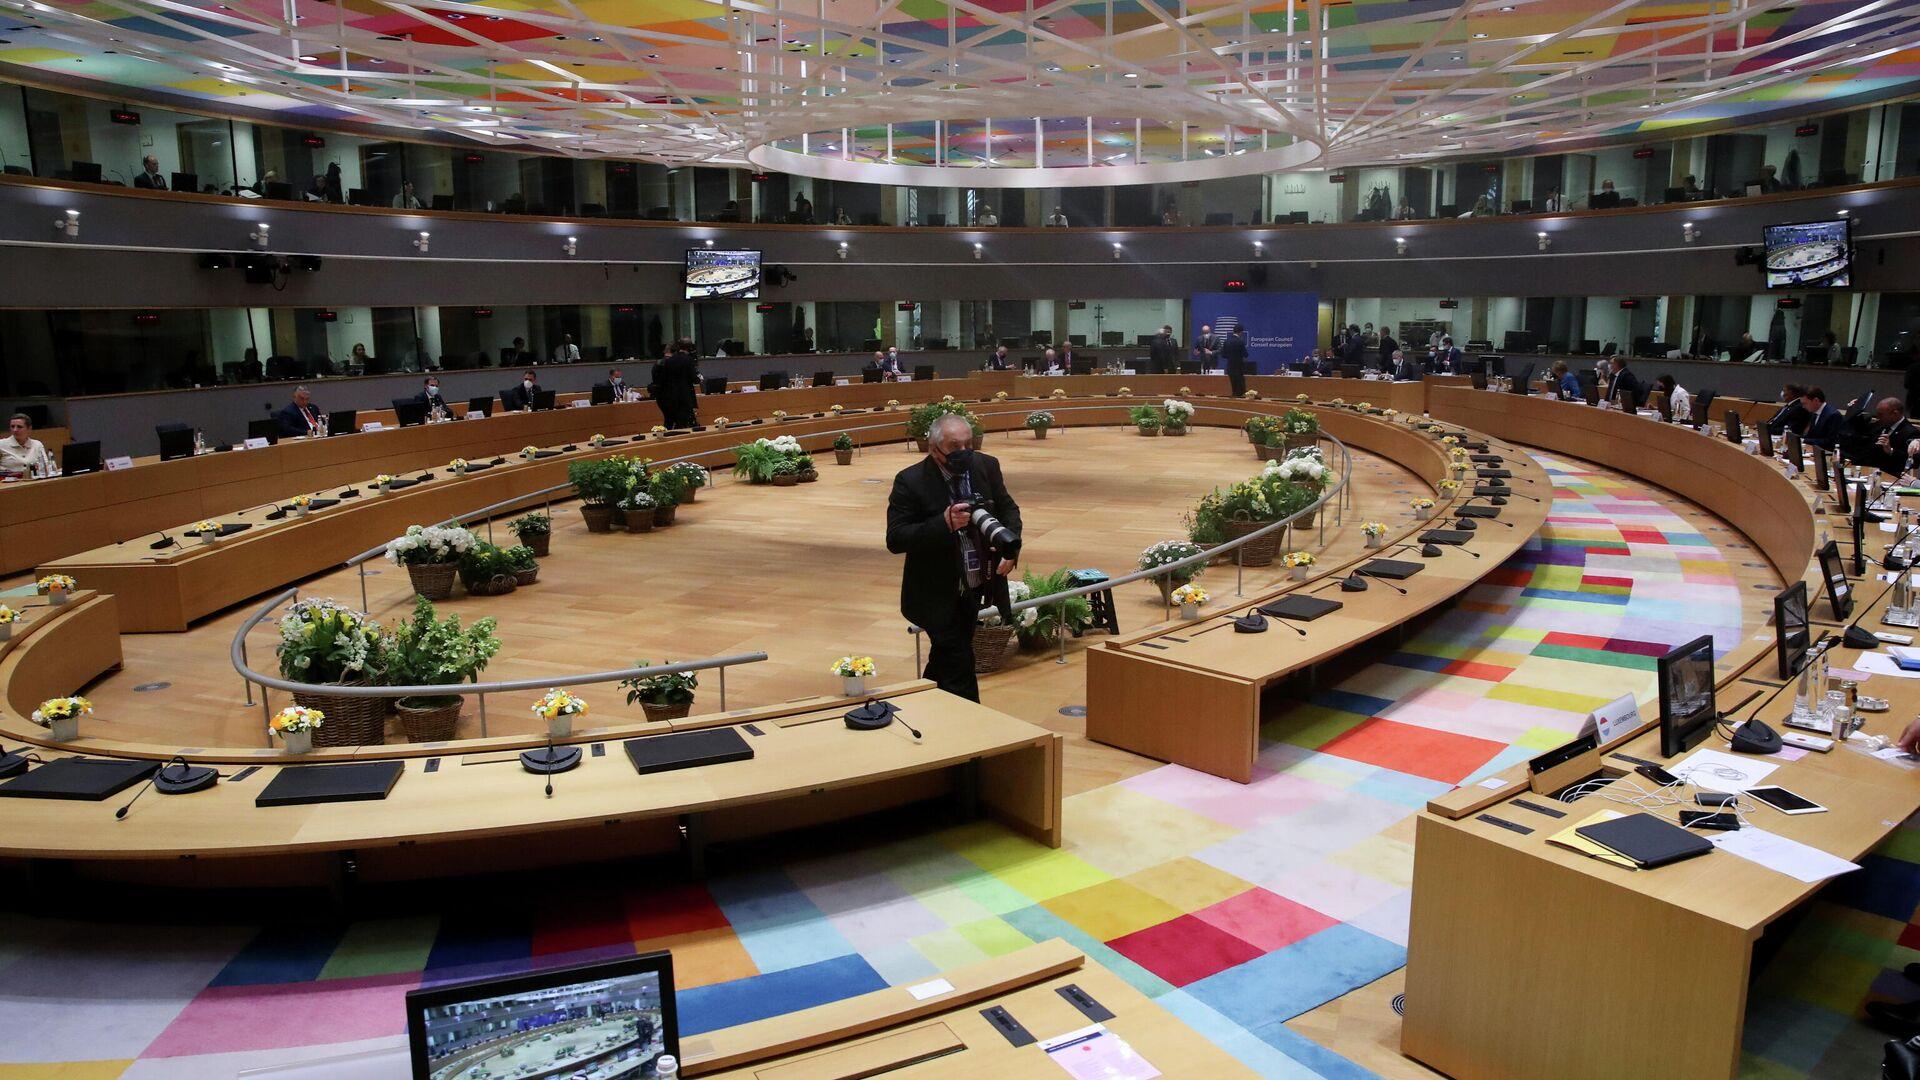 Cumbre de la UE en Bruselas - Sputnik Mundo, 1920, 24.05.2021